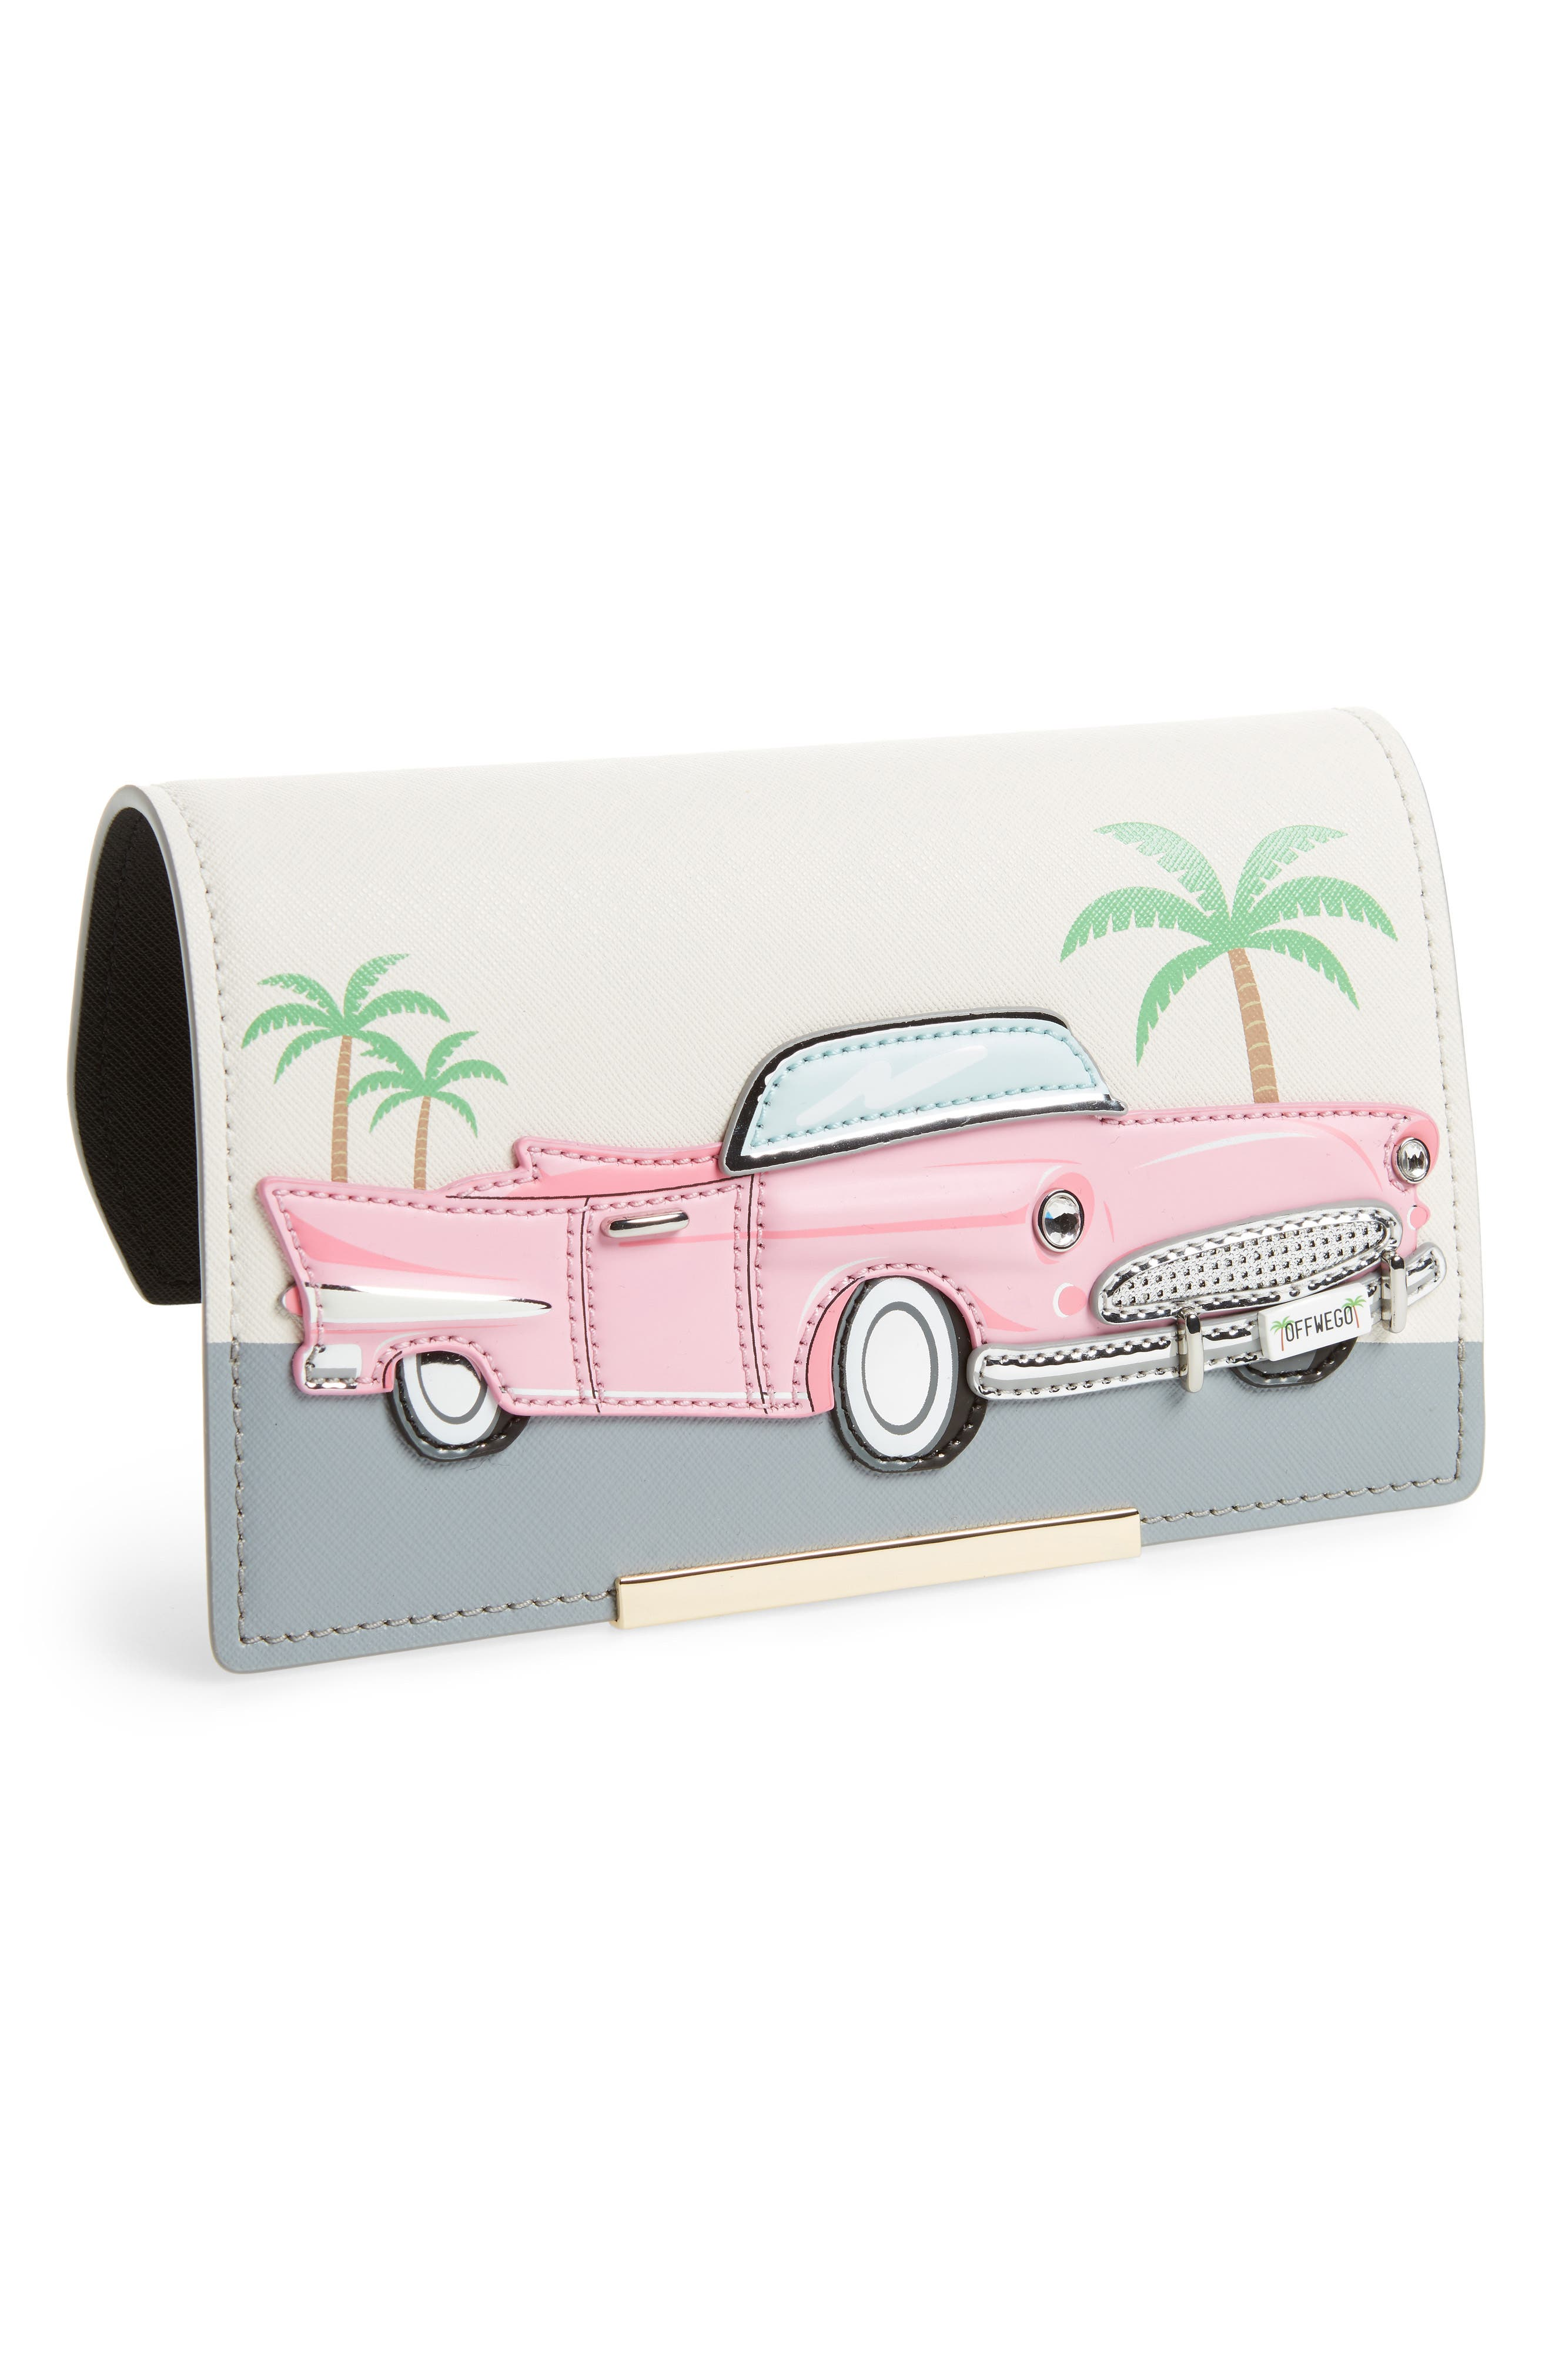 make it mine leather vintage car snap-on accent flap,                             Main thumbnail 1, color,                             650